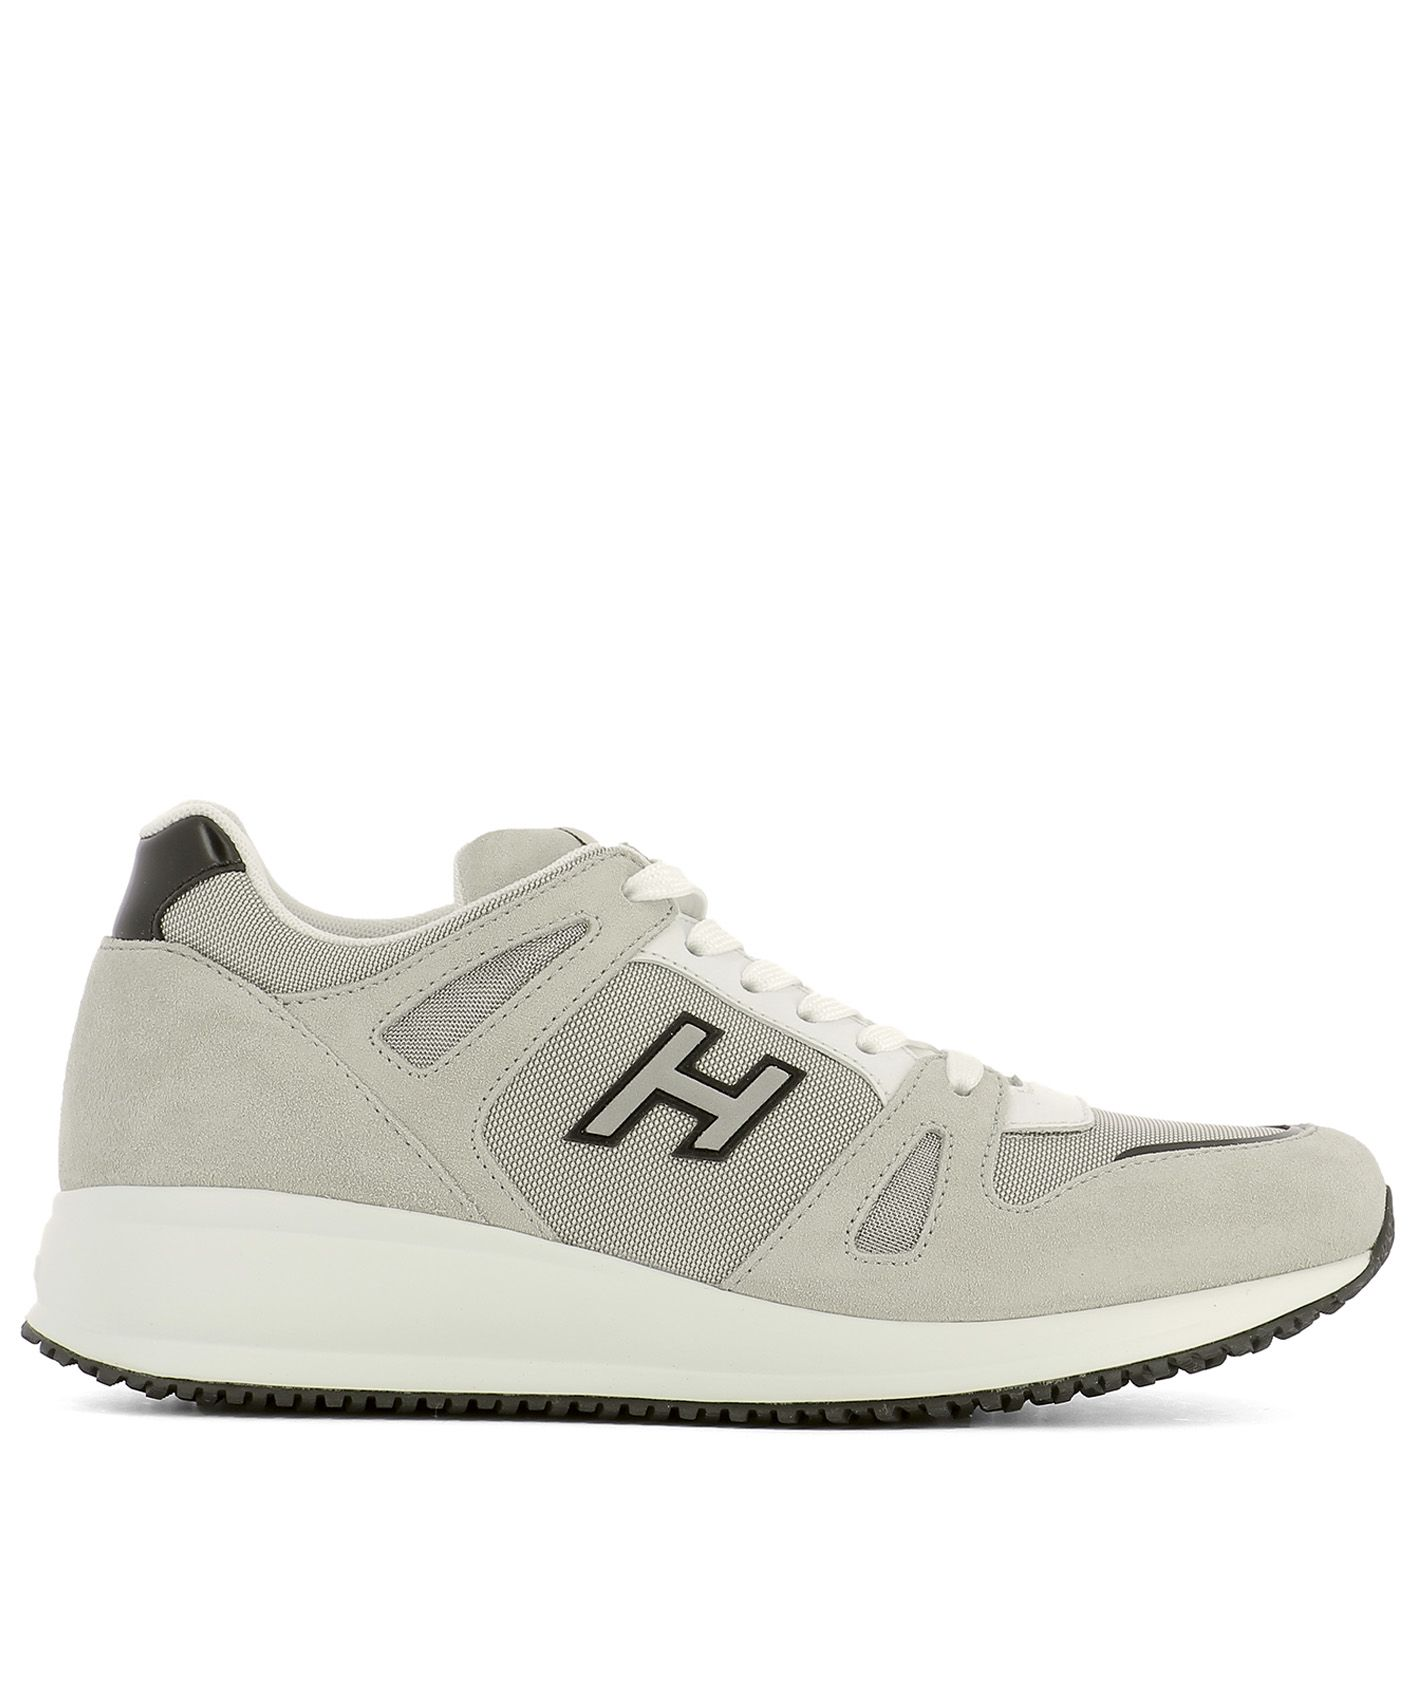 Beige Fabric Sneakers